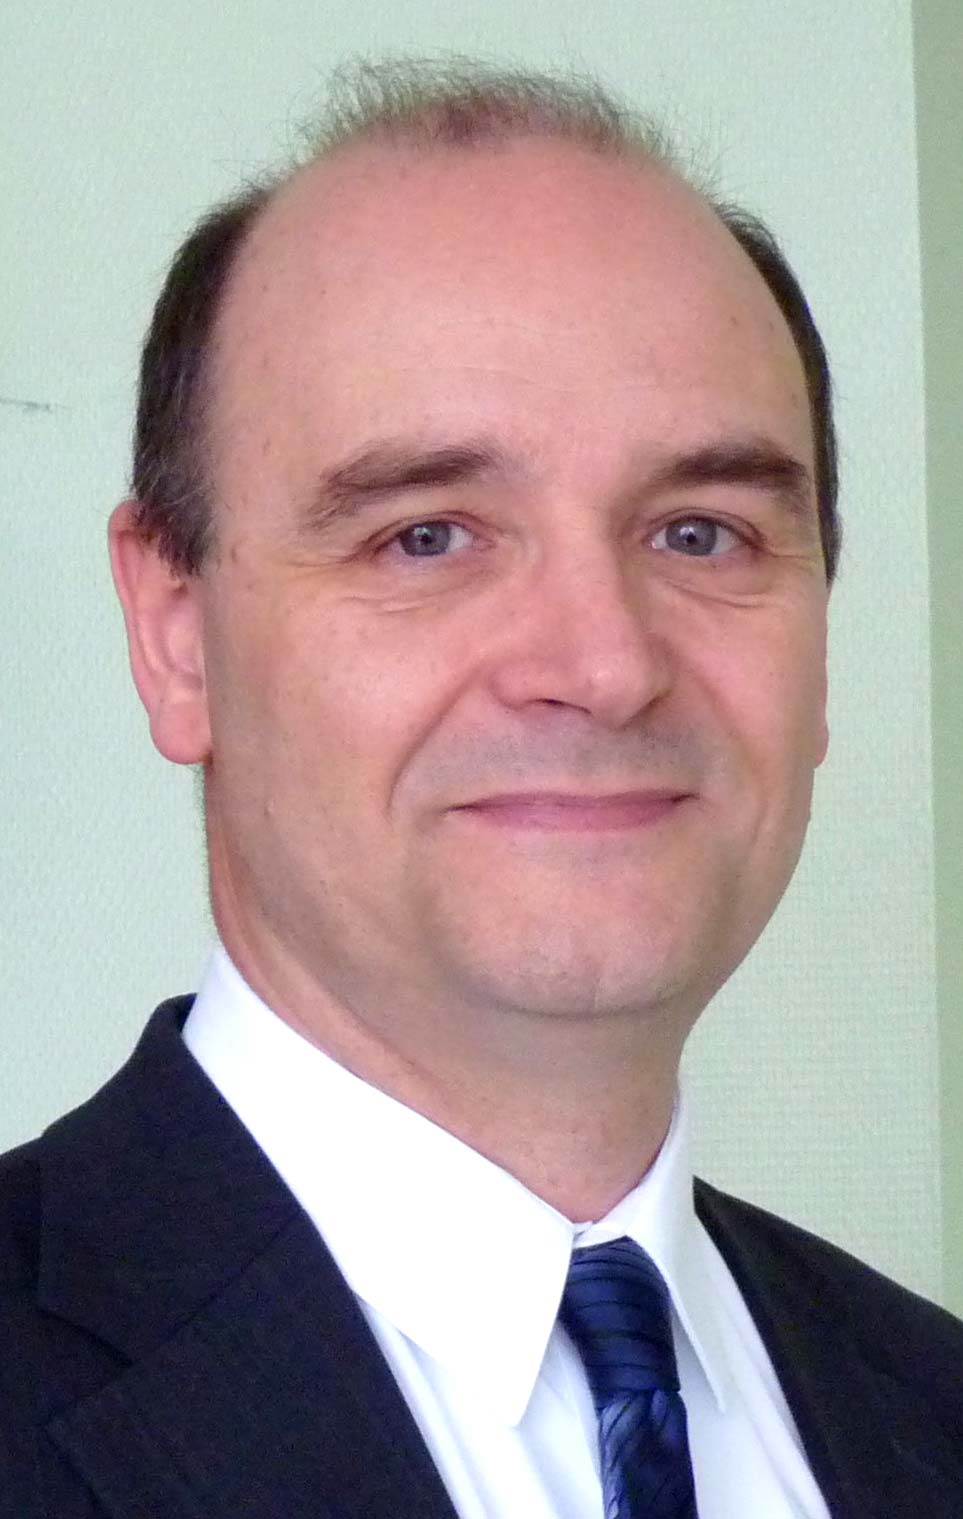 Prof. Jérôme Honnorat